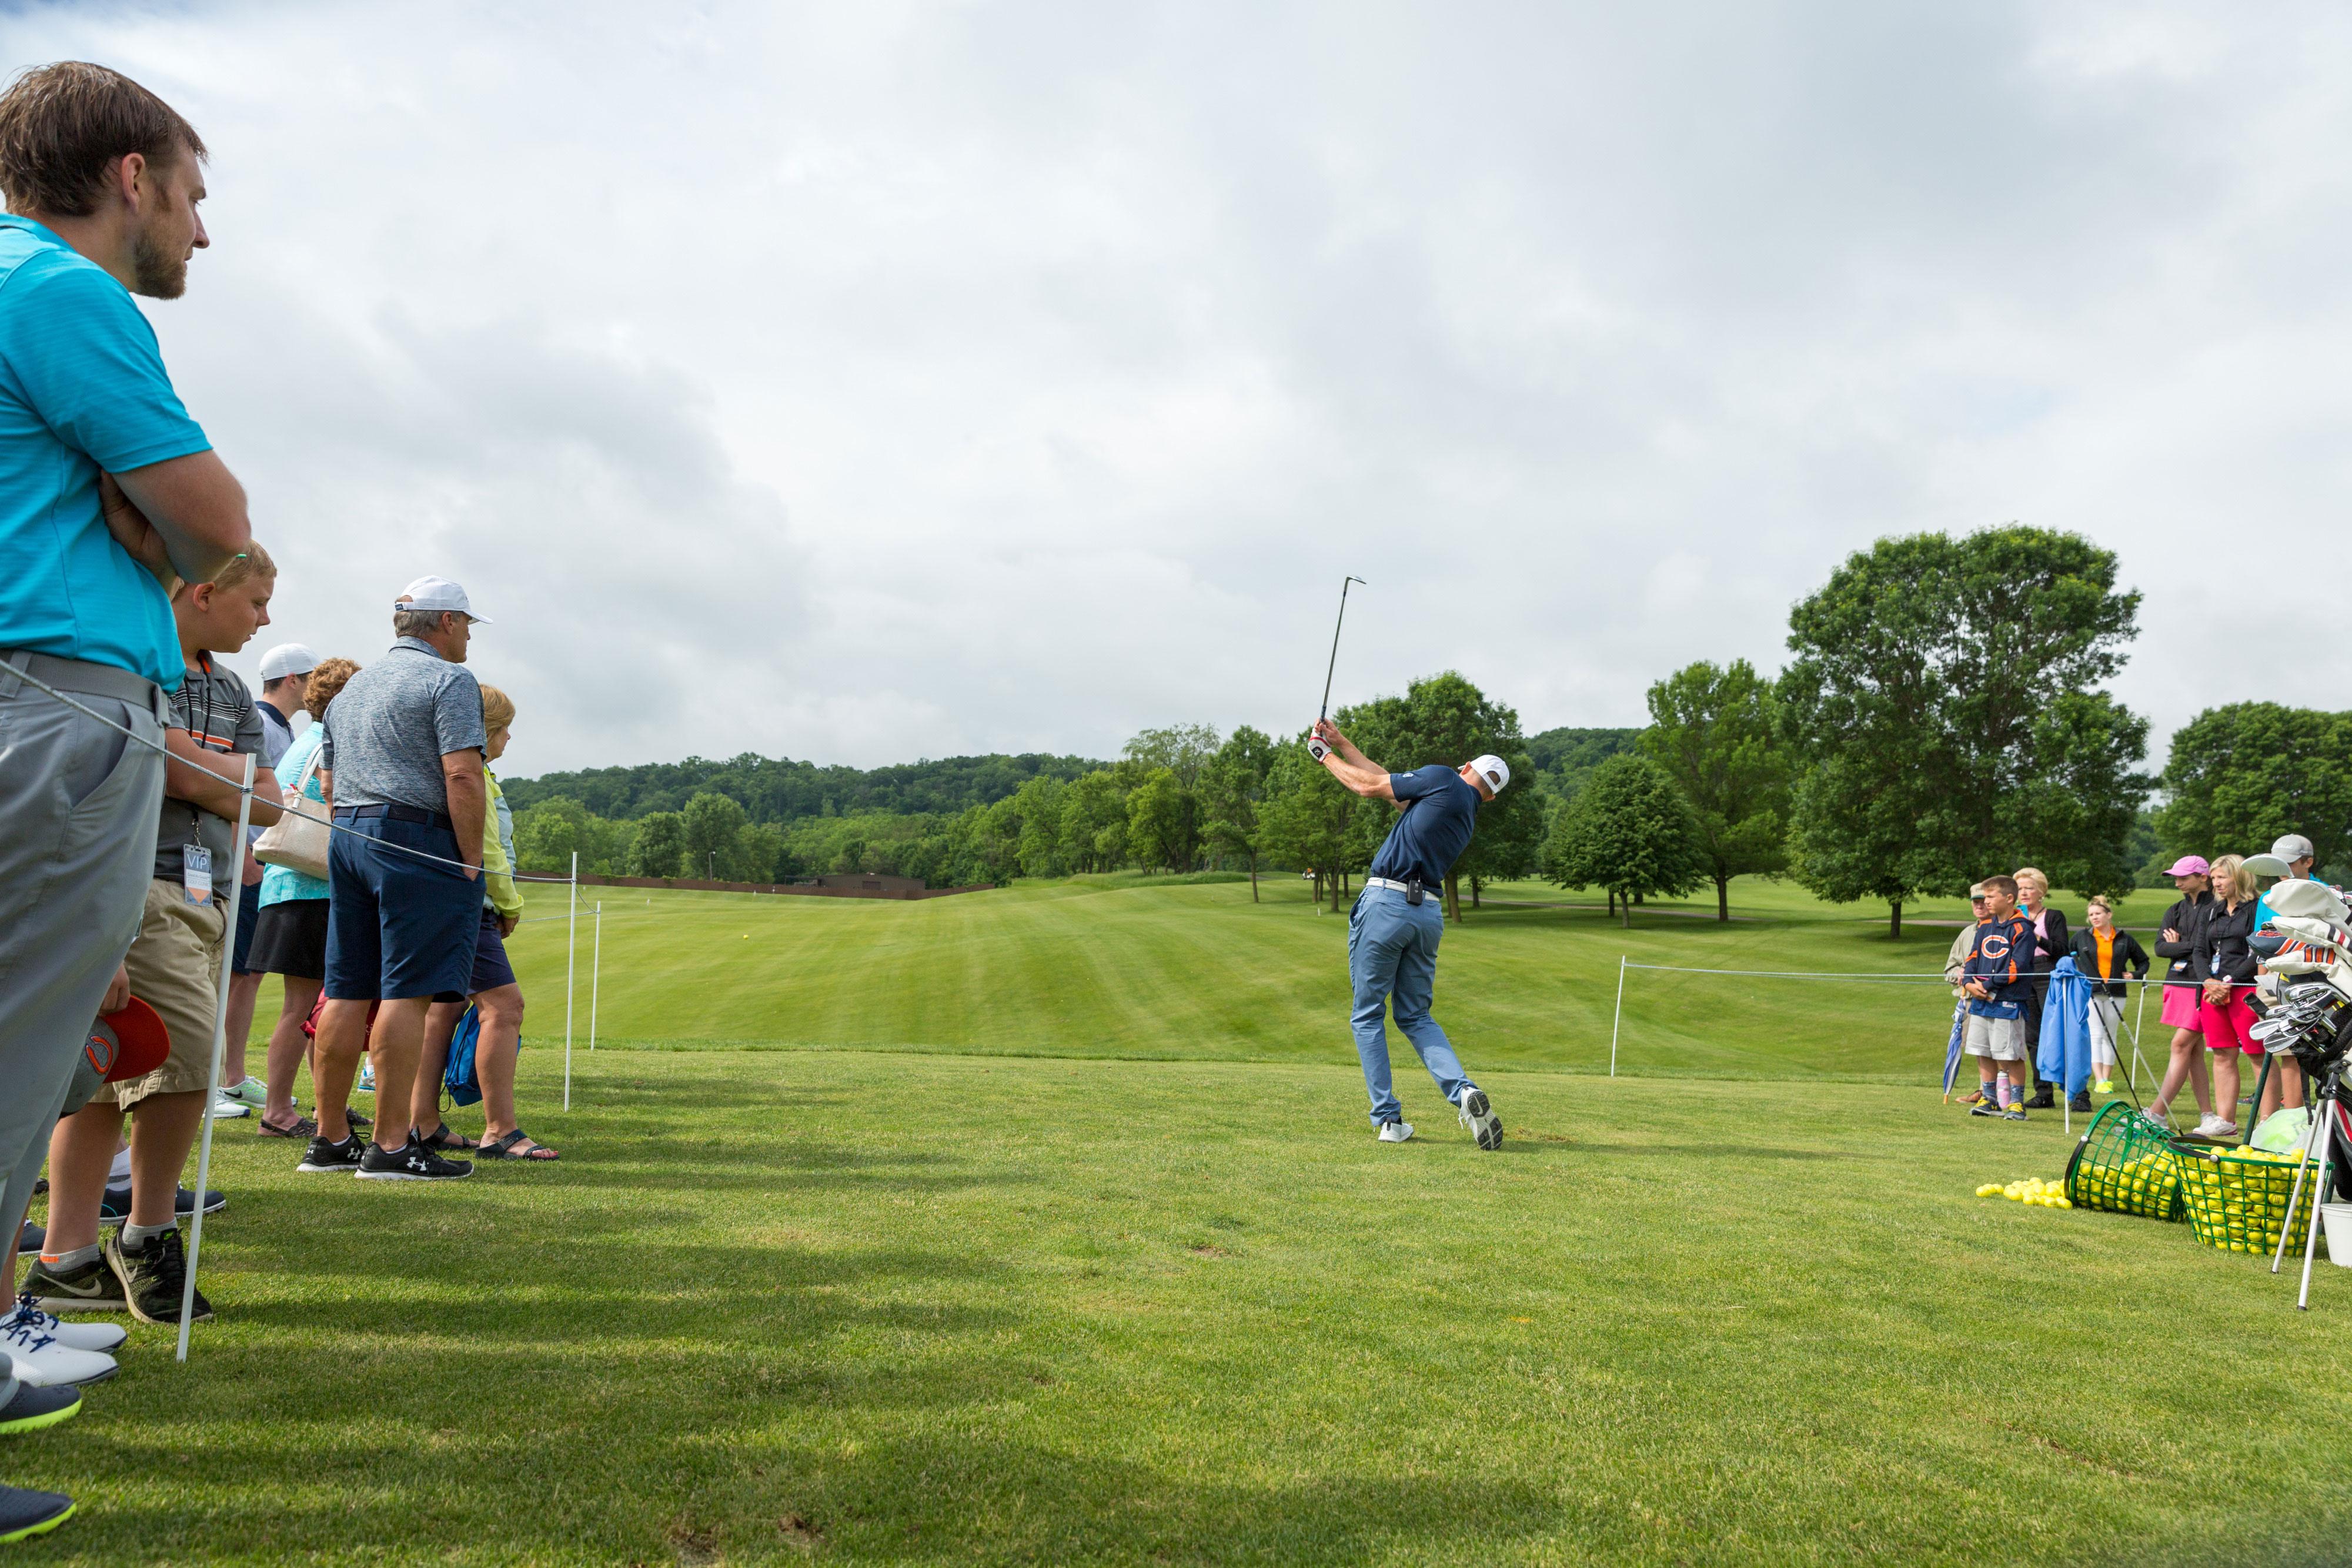 Robbie-Gould-Golf-Clinic-016-smaller